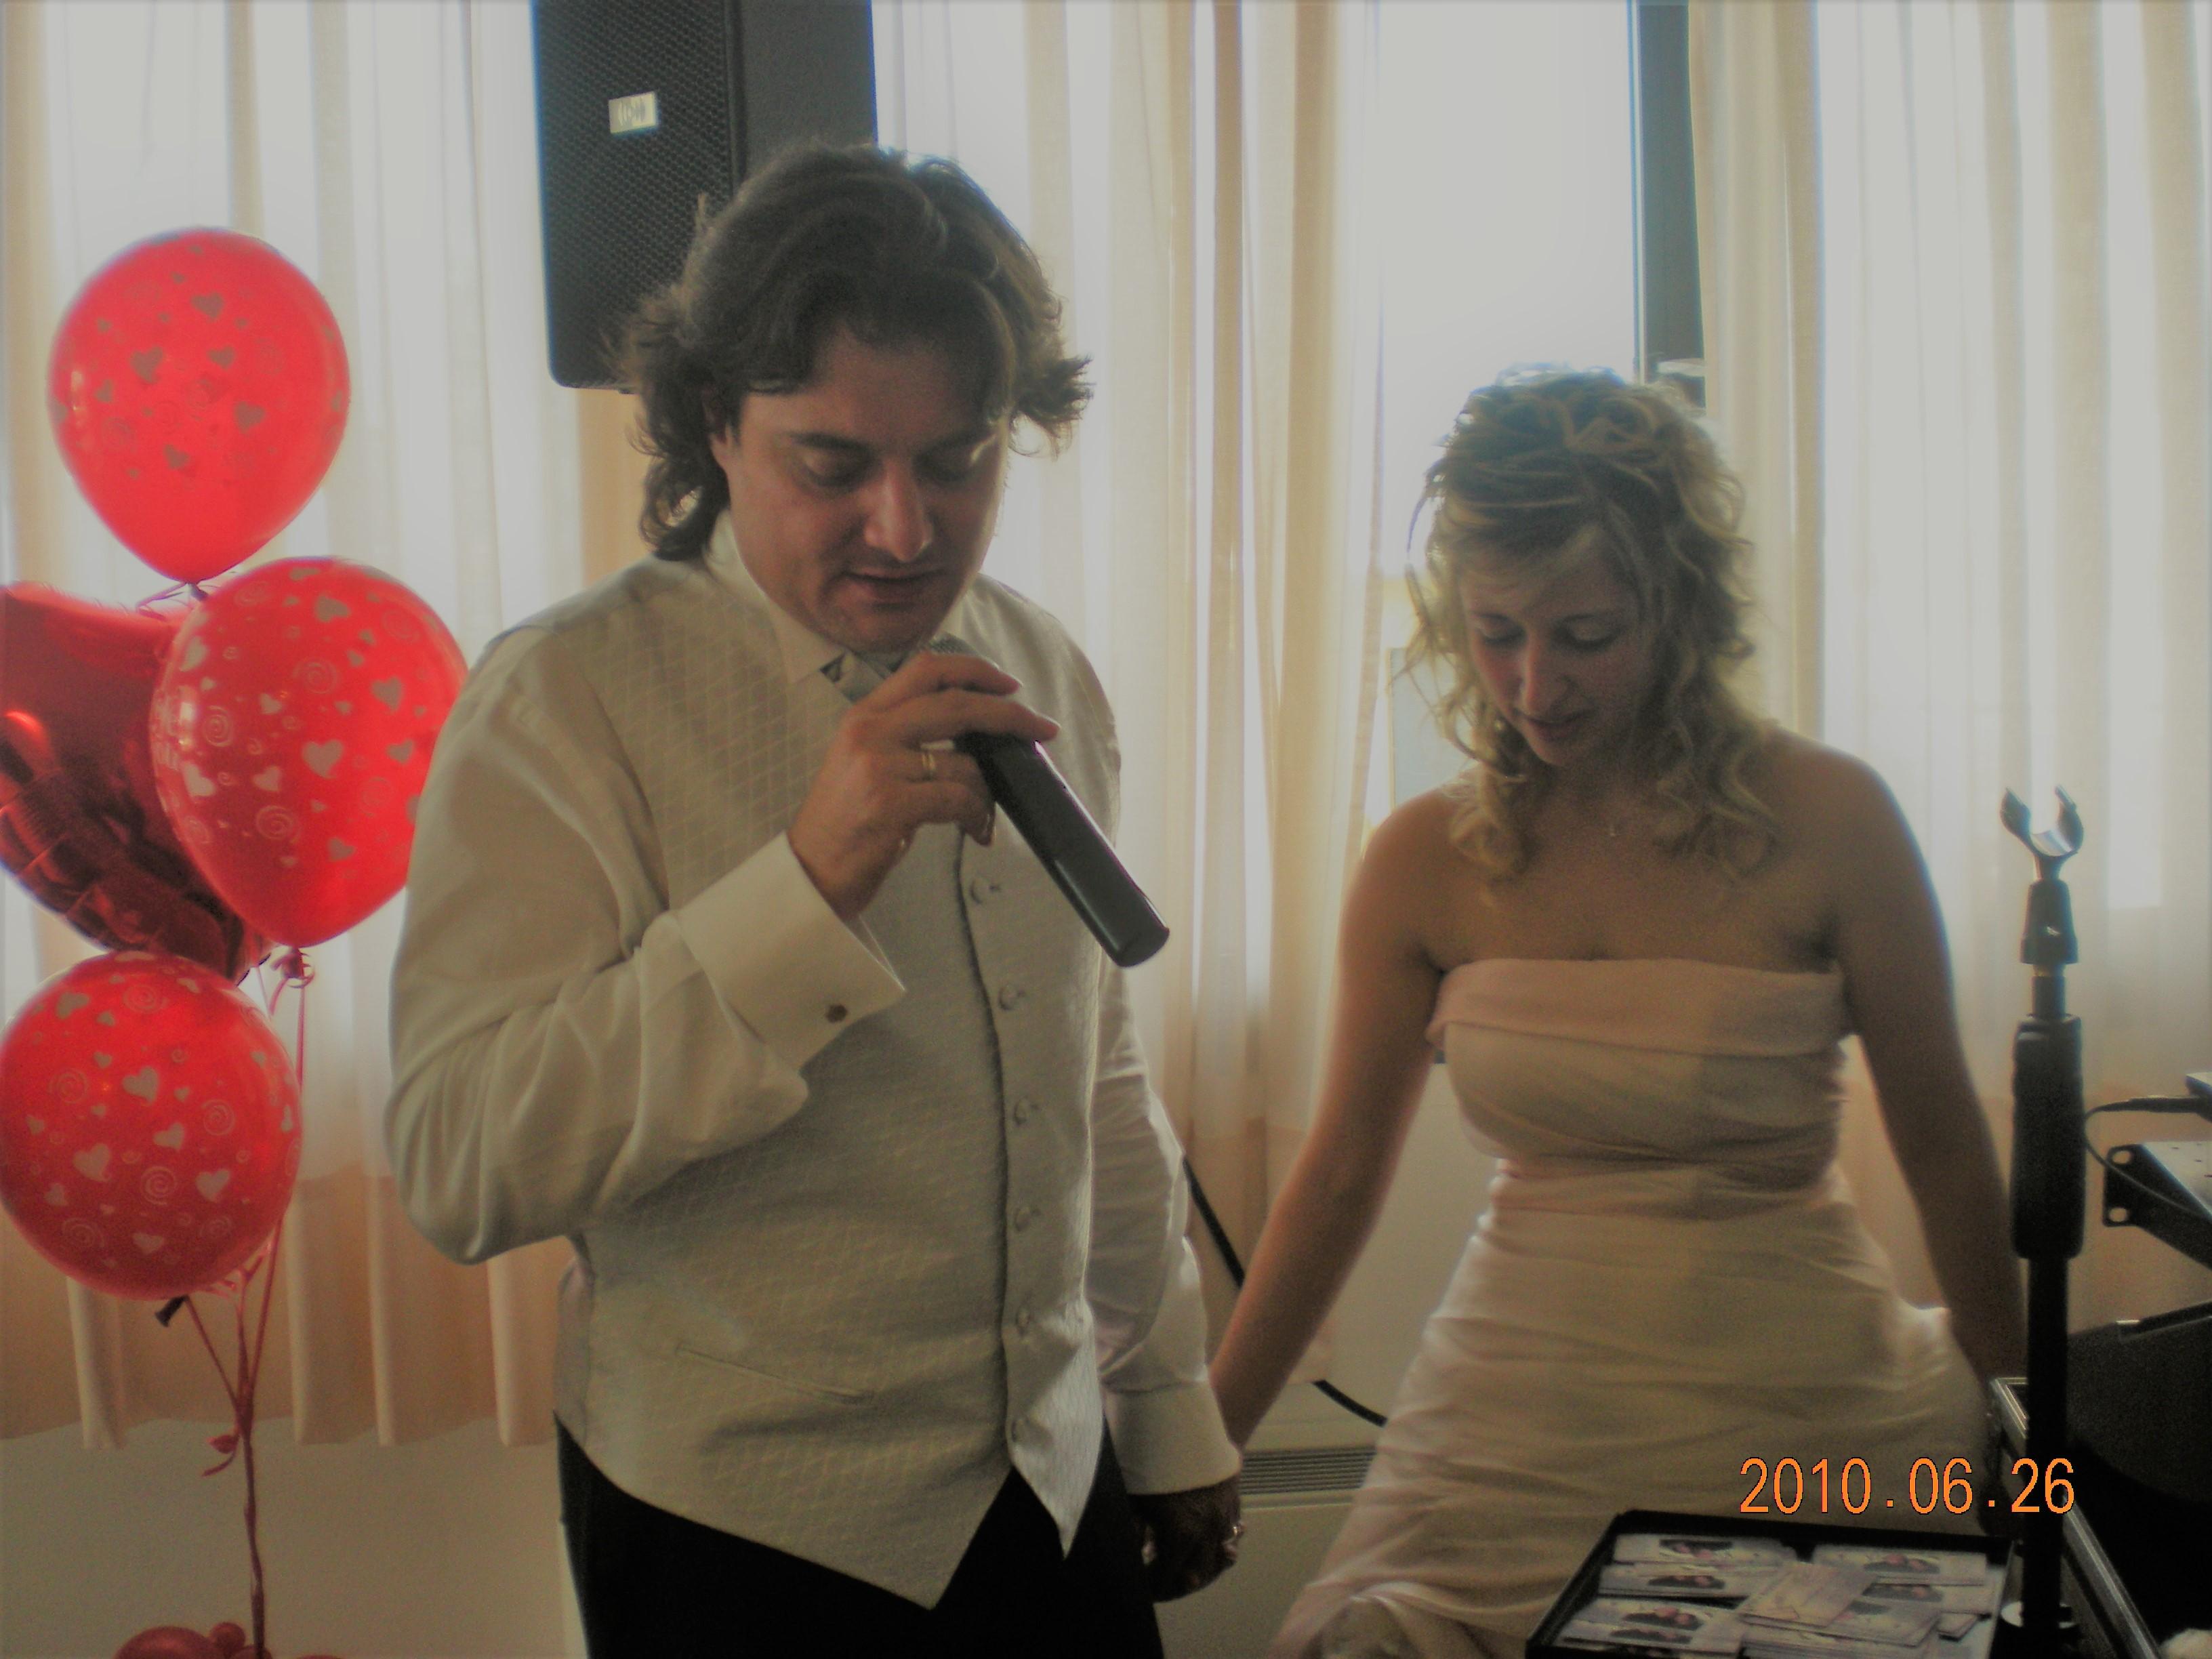 Francesco e Rosanna - 26.06.2010 - 034.JPG